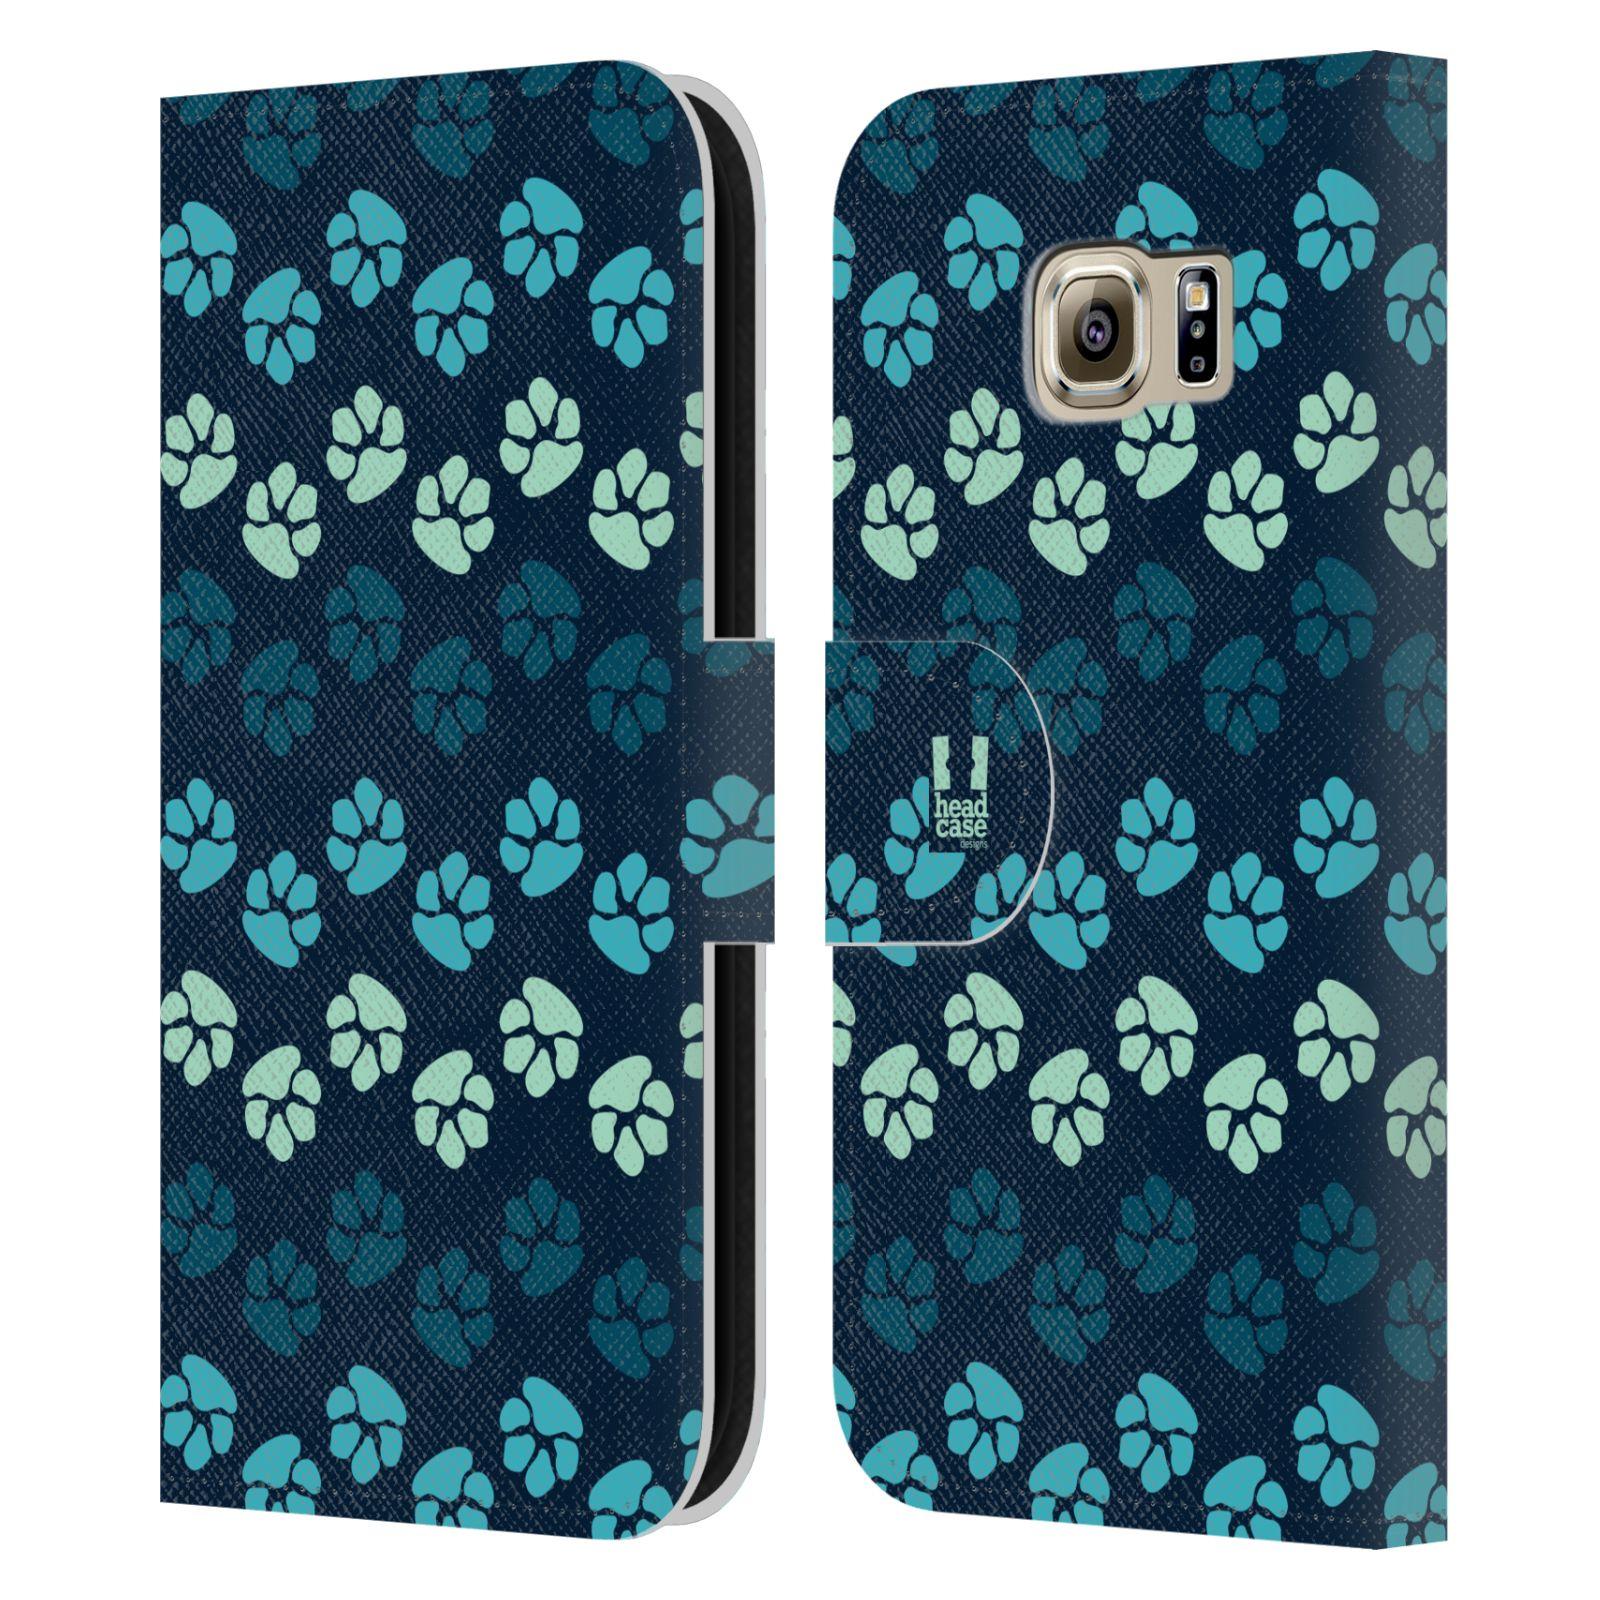 HEAD CASE Flipové pouzdro pro mobil Samsung Galaxy S6 (G9200) Pejsek ťapky modrá barva